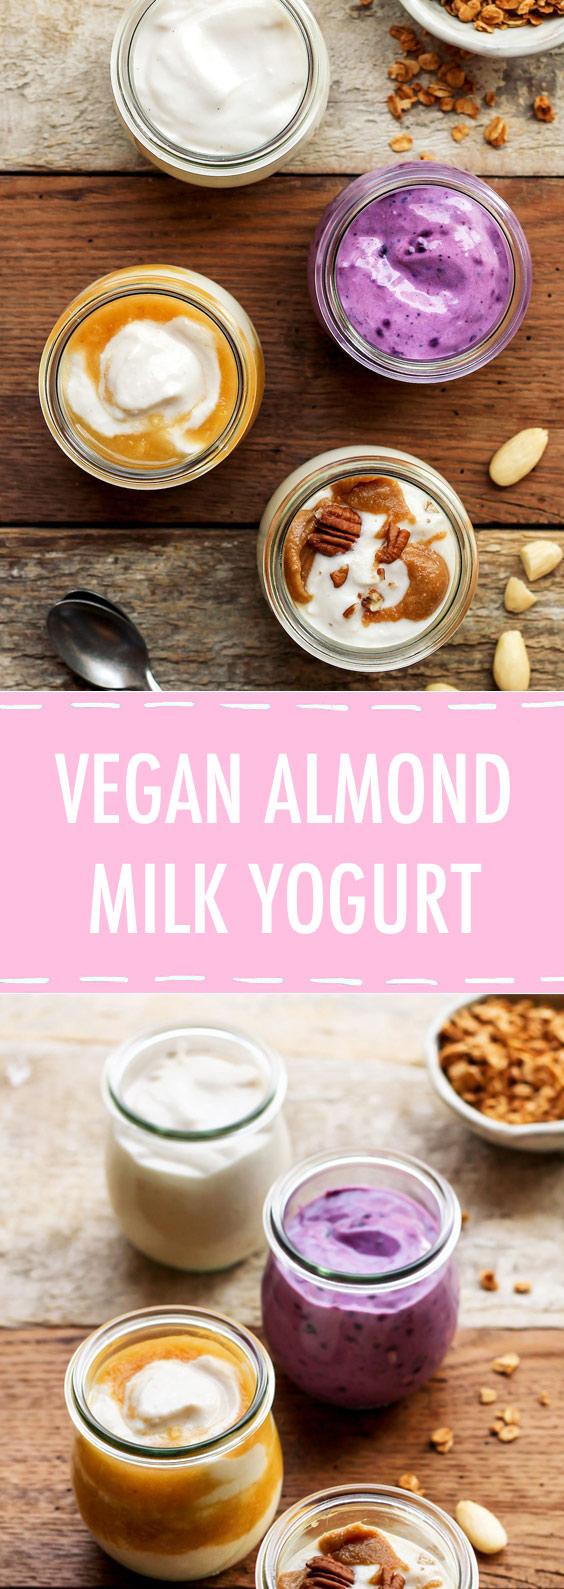 Vegan Almond Milk Yogurt